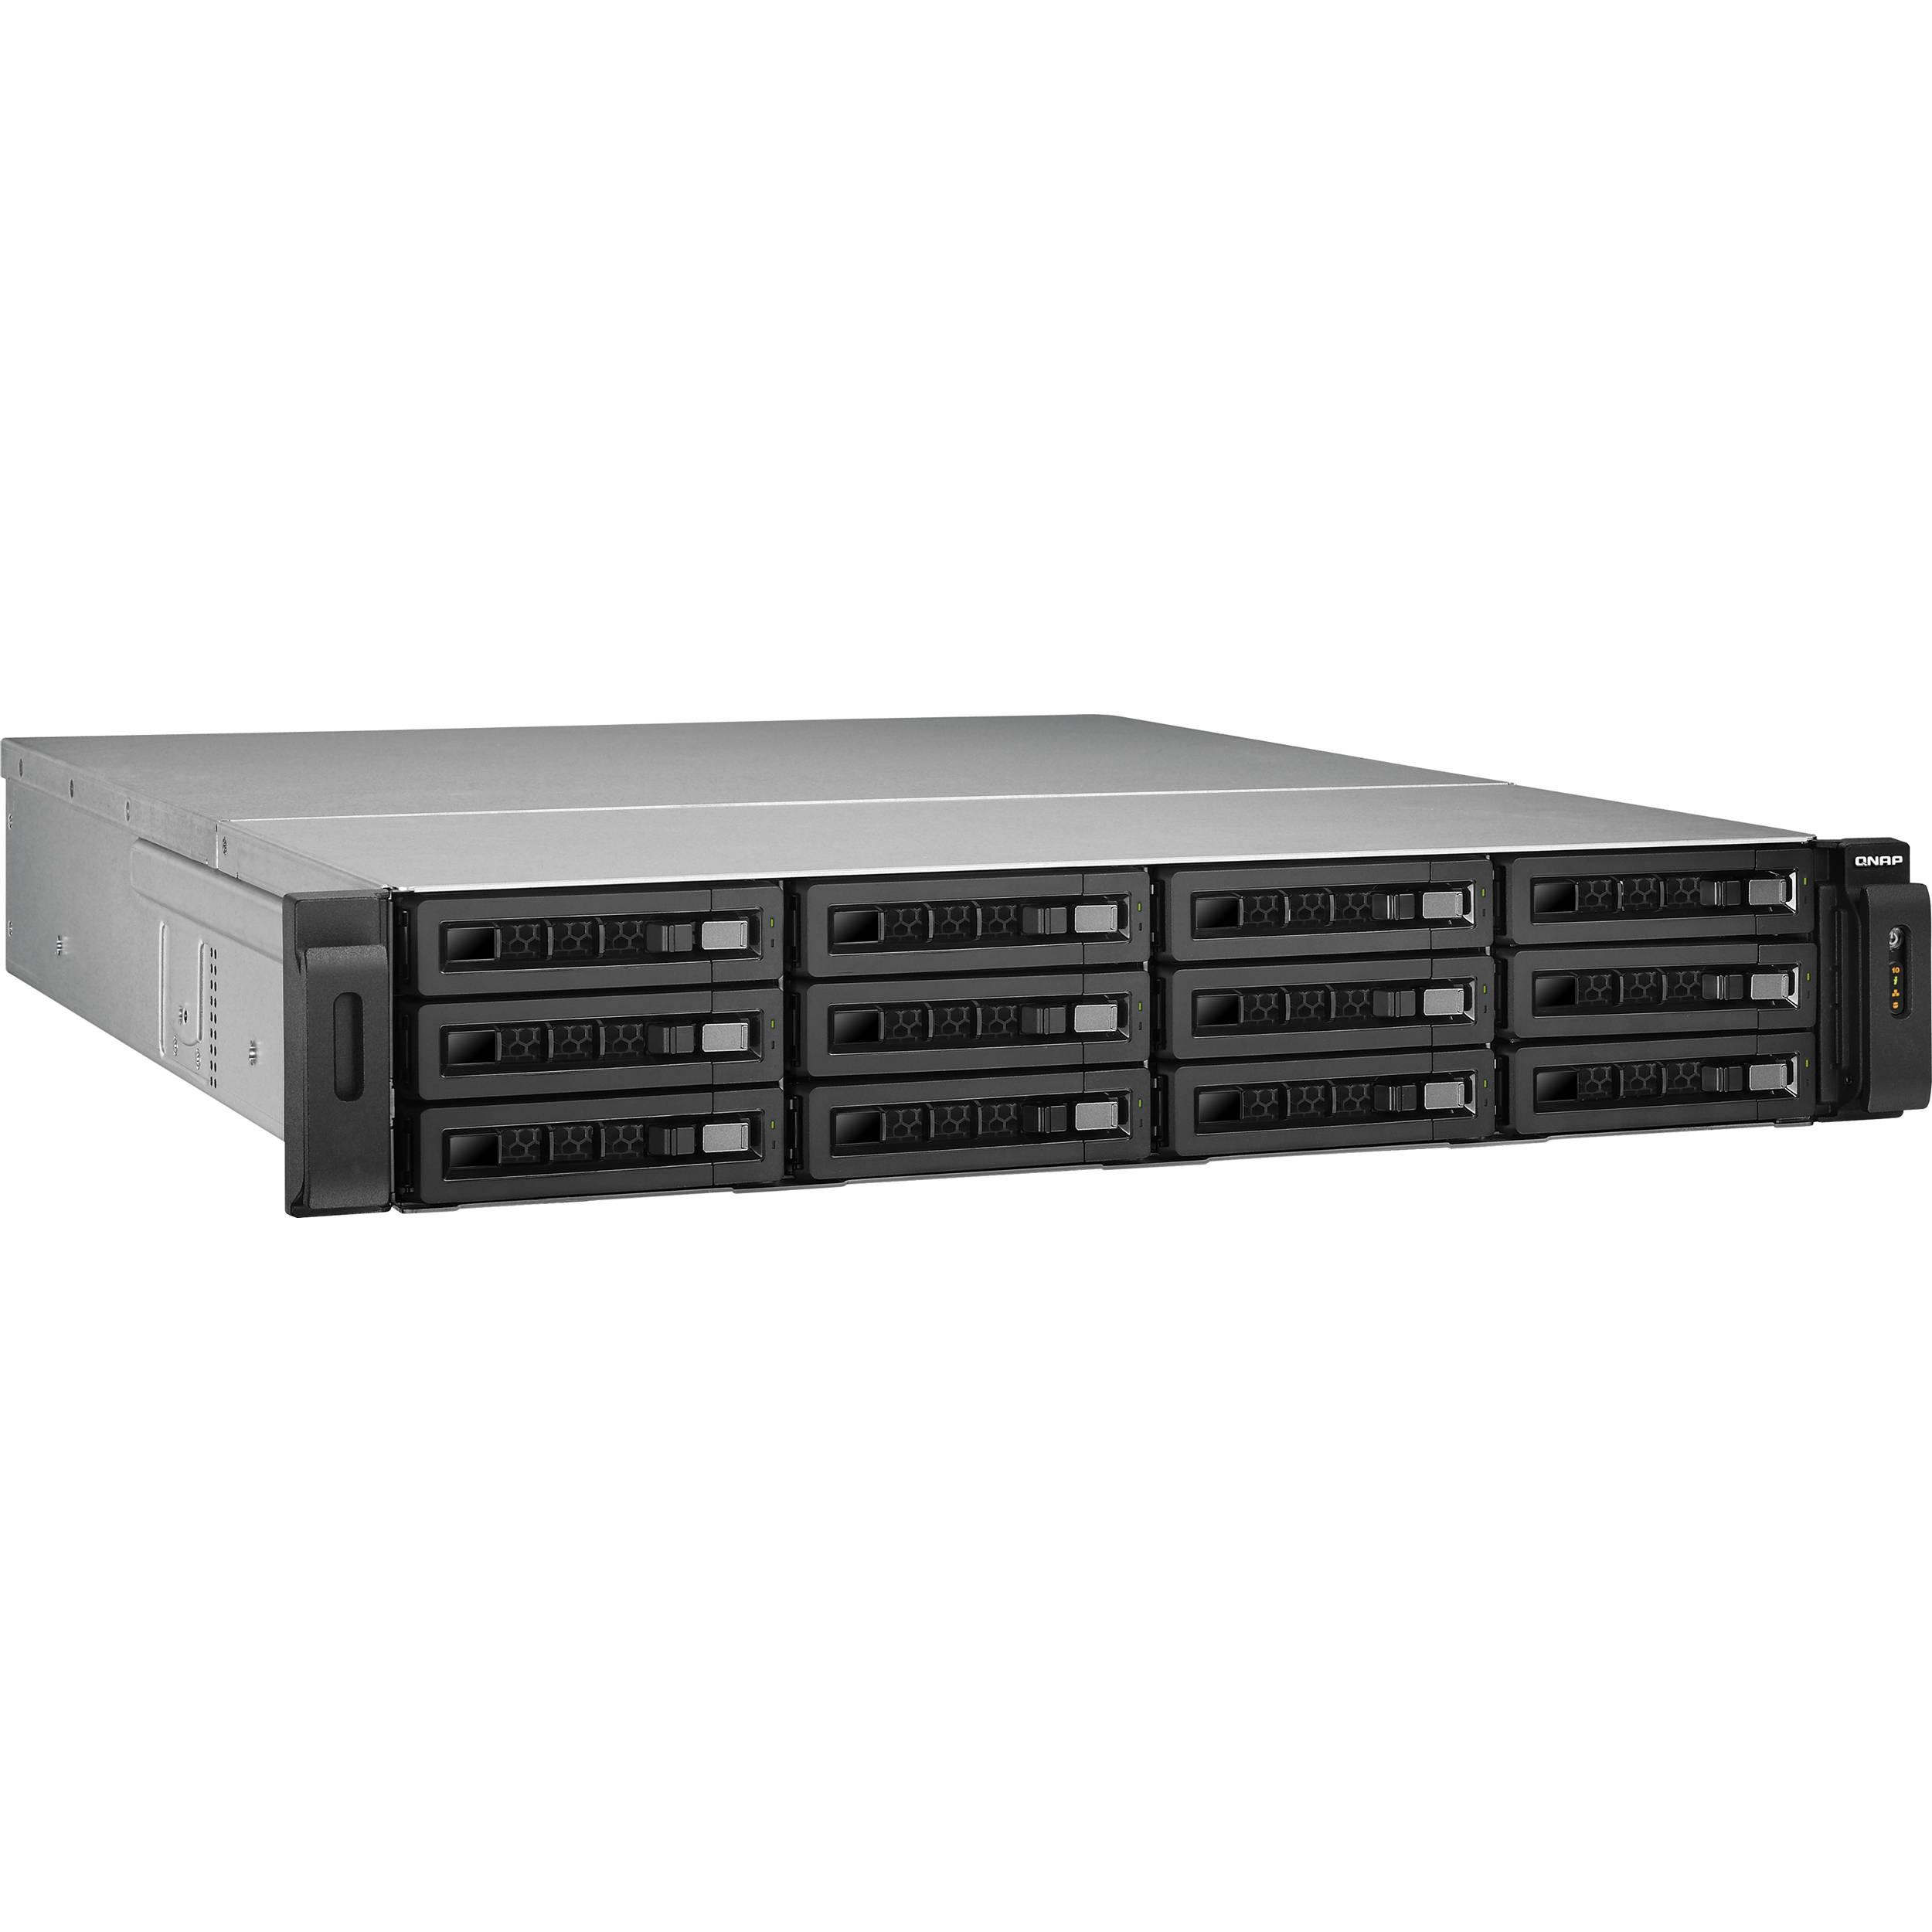 QNAP TS-1279U-RP 12 Bay IP-SAN Storage Solution with 10GbE Bundle